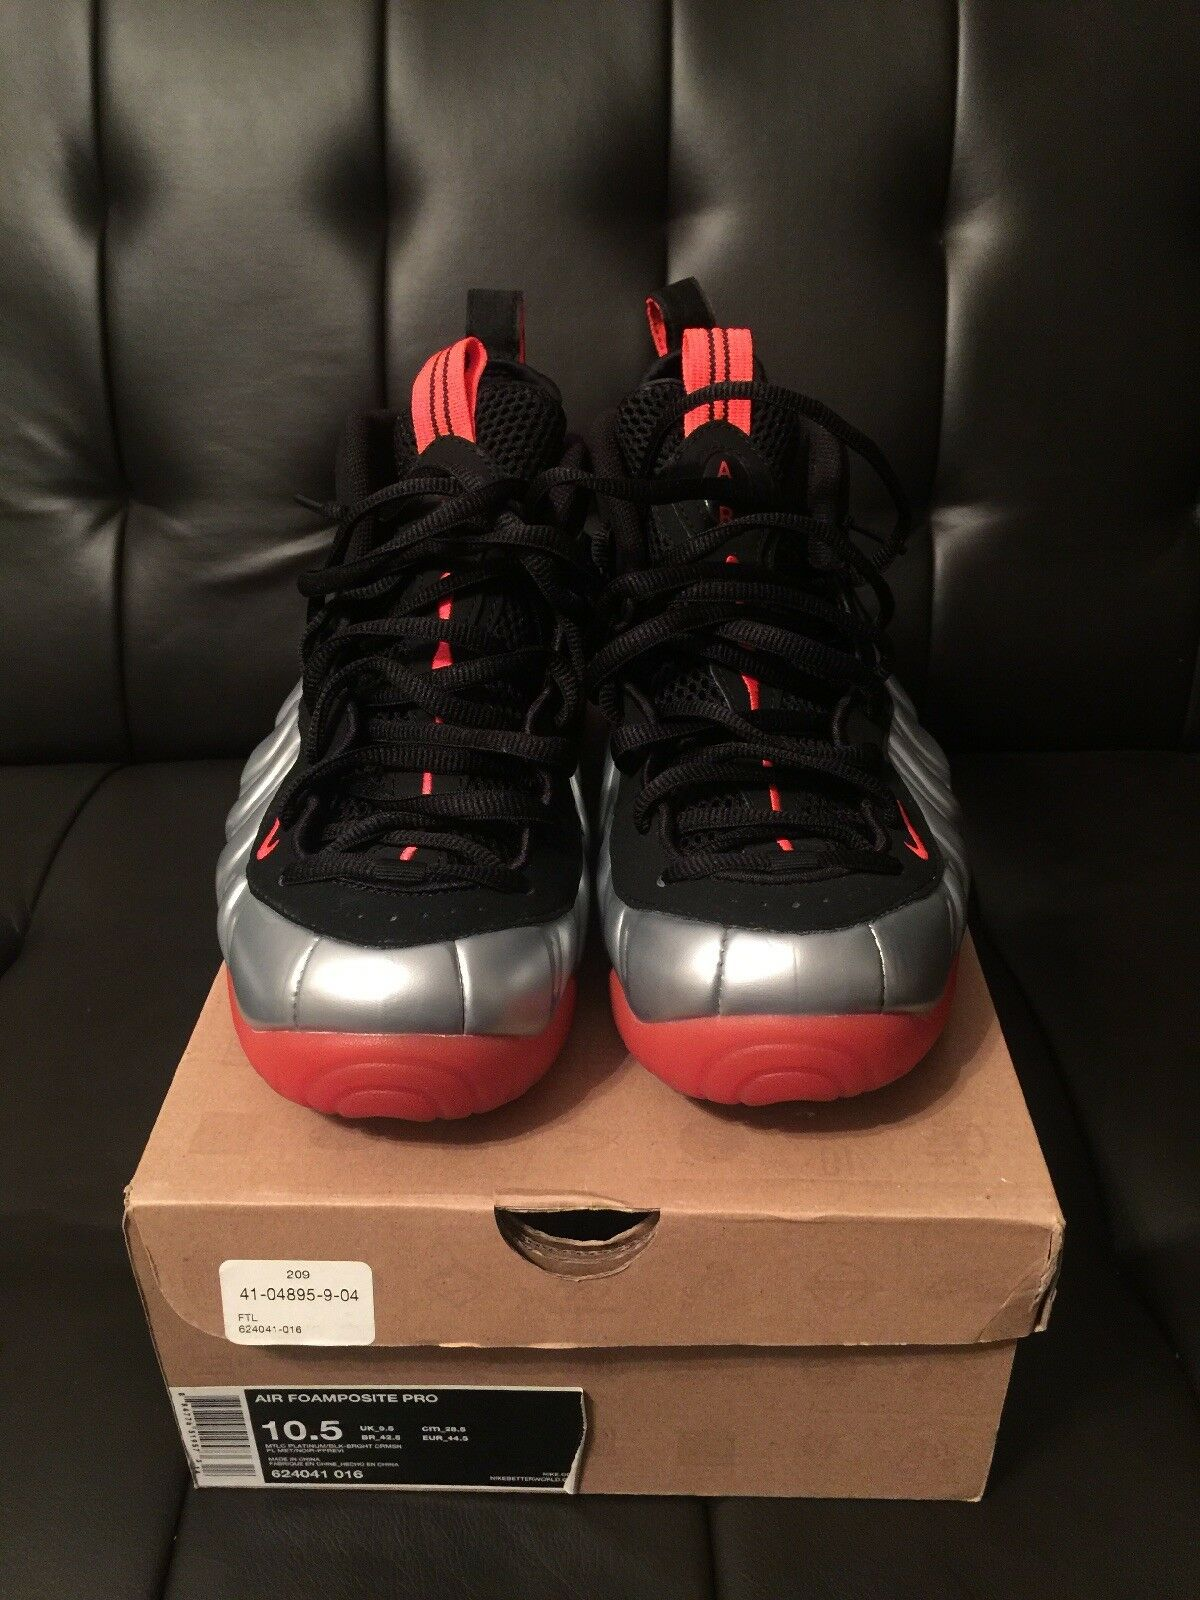 Nike Air Foamposite Crimson Pro Mtlc Platinum Bright Crimson Foamposite Size 11 372a19